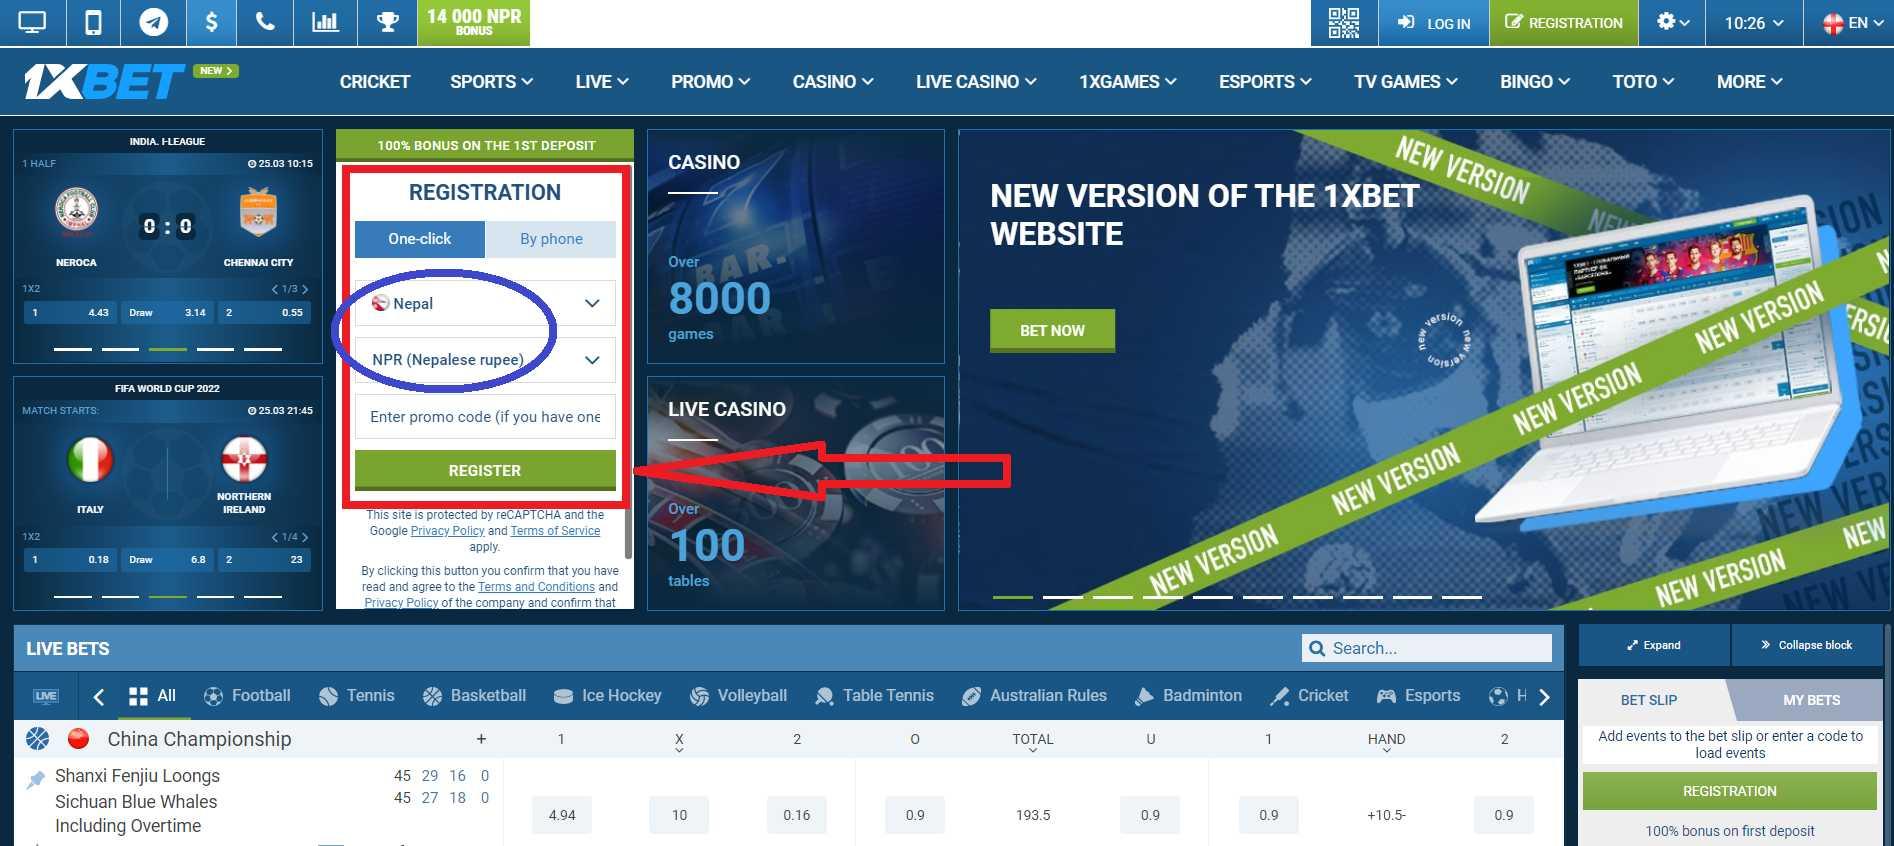 Online registration in the 1XBET